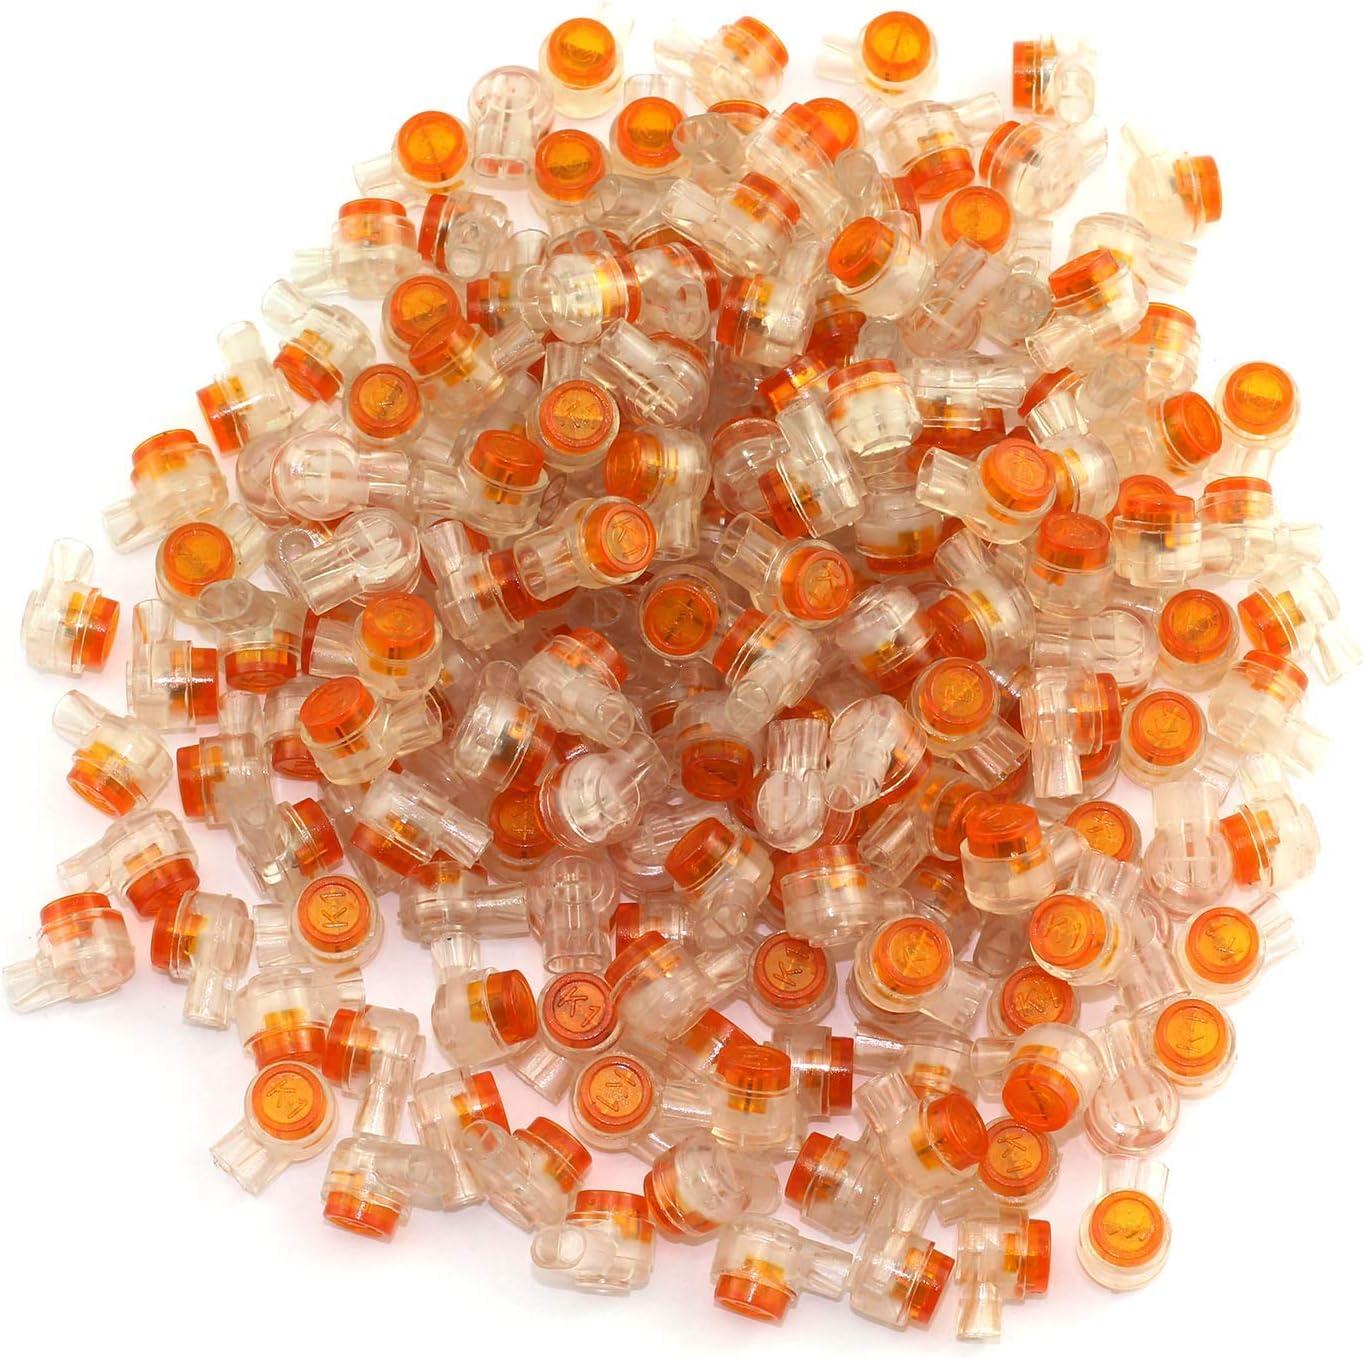 200 Stücke Kunststoff K1 2 Ports Gel Splice UY Kabelverbinder klar orange P ML